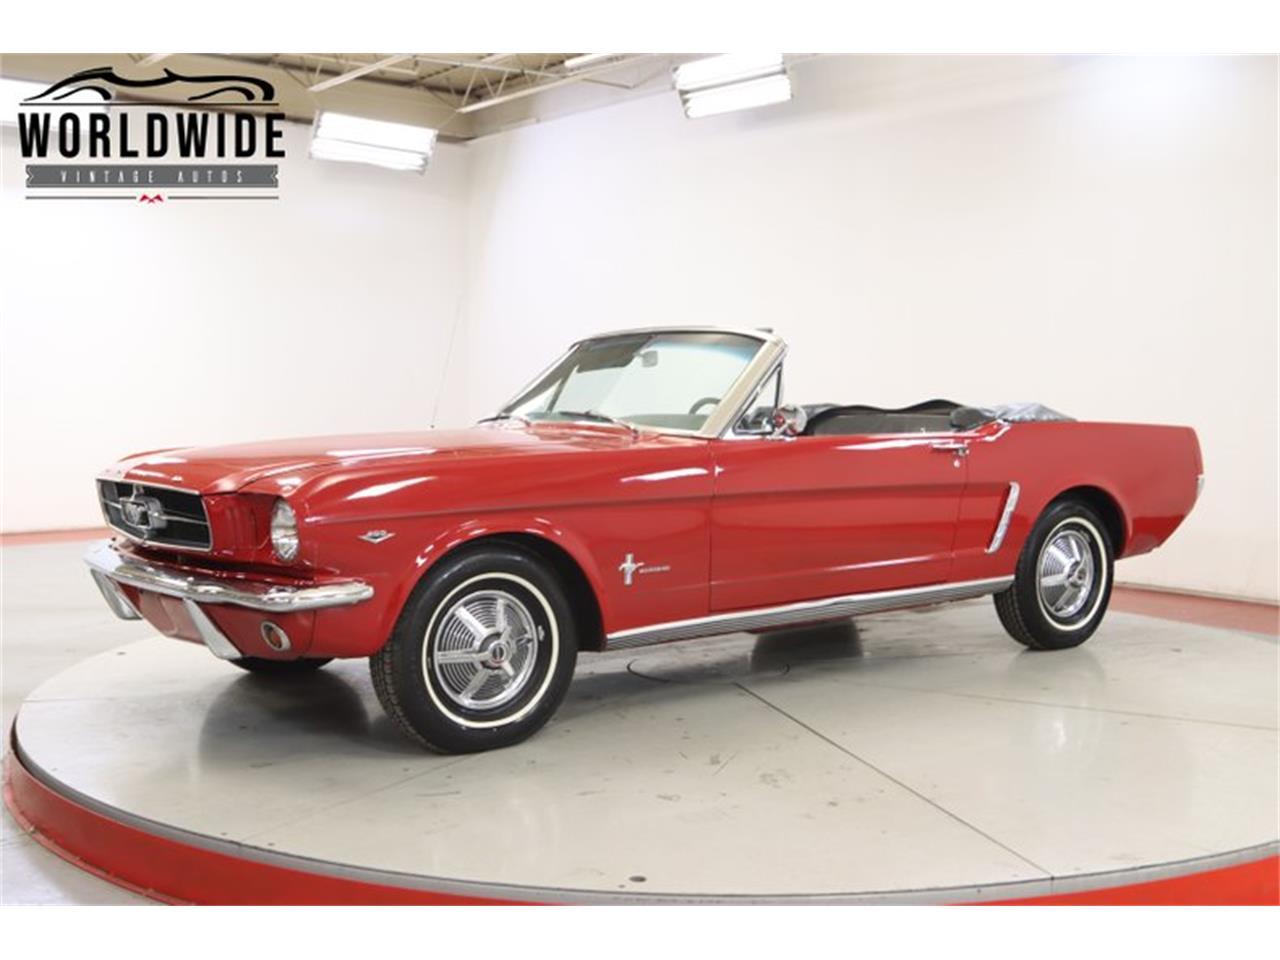 Ford Mustang Gta v8 1965 prix tout compris 1965